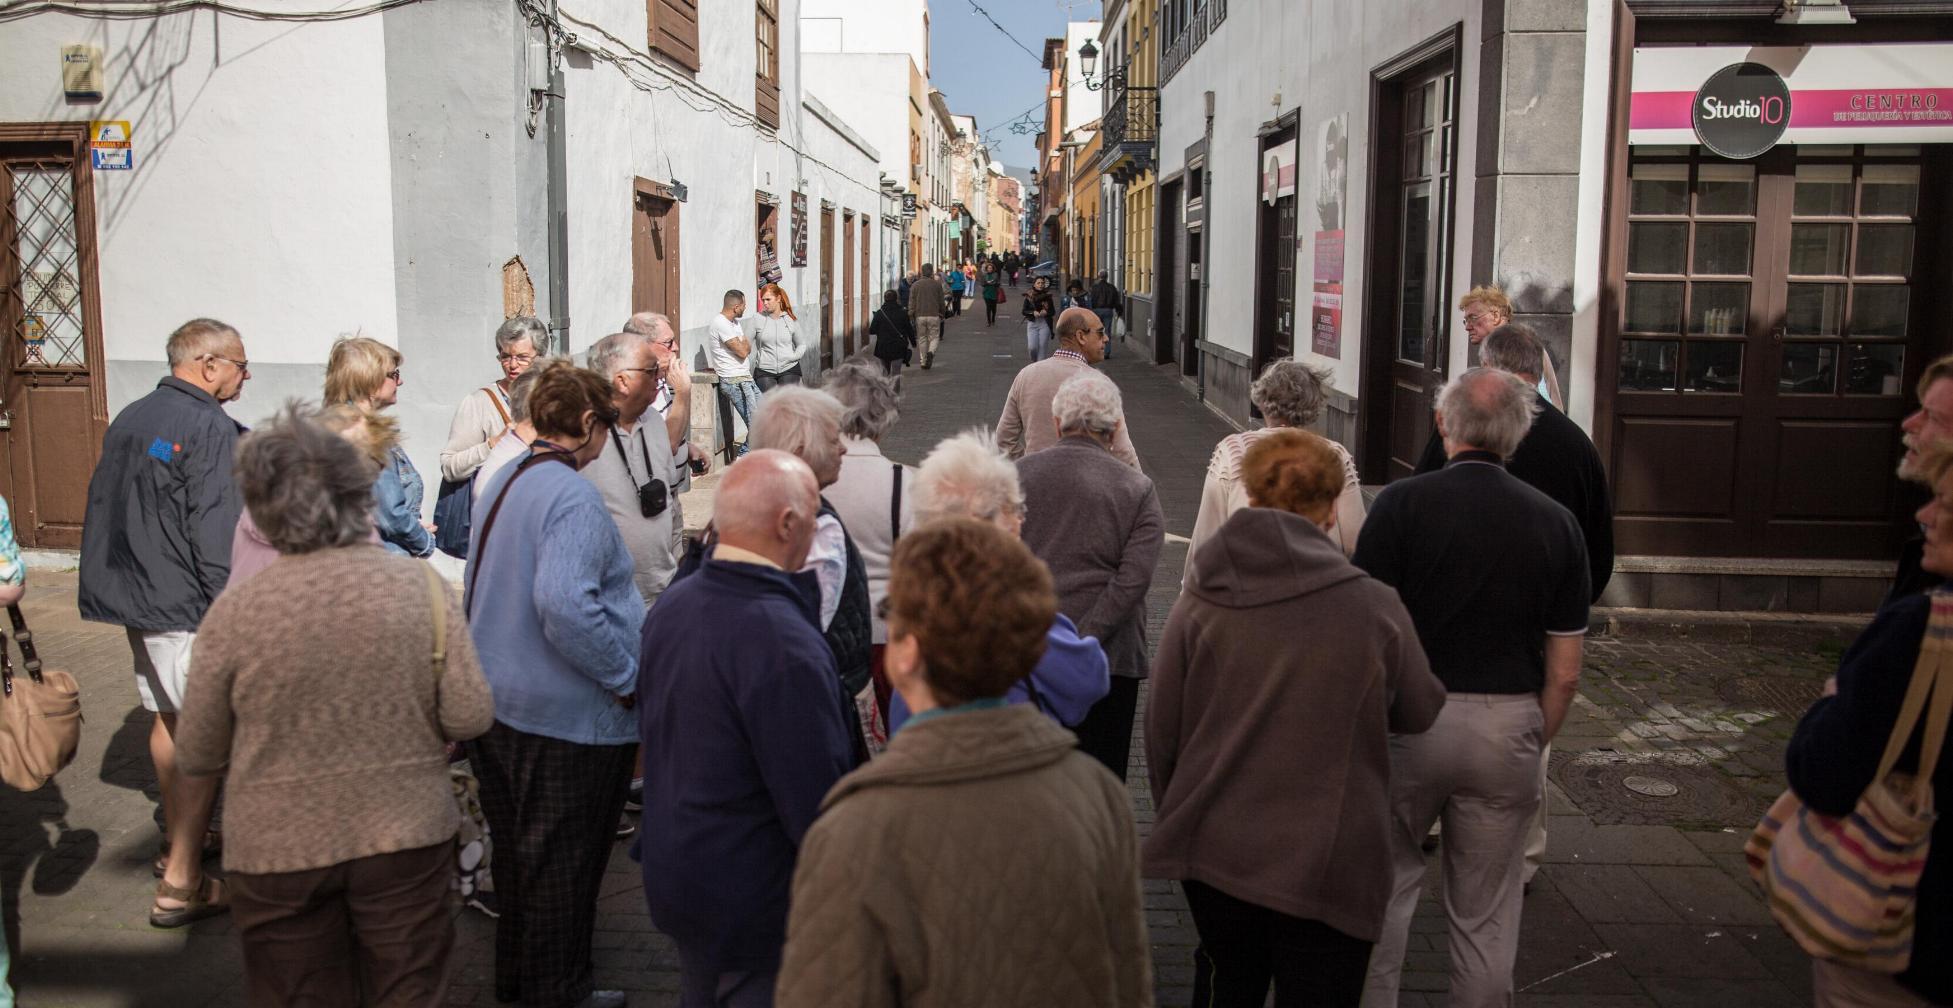 Un grupo de turistas, en el casco histórico de La Laguna. / ANDRÉS GUTIÉRREZ